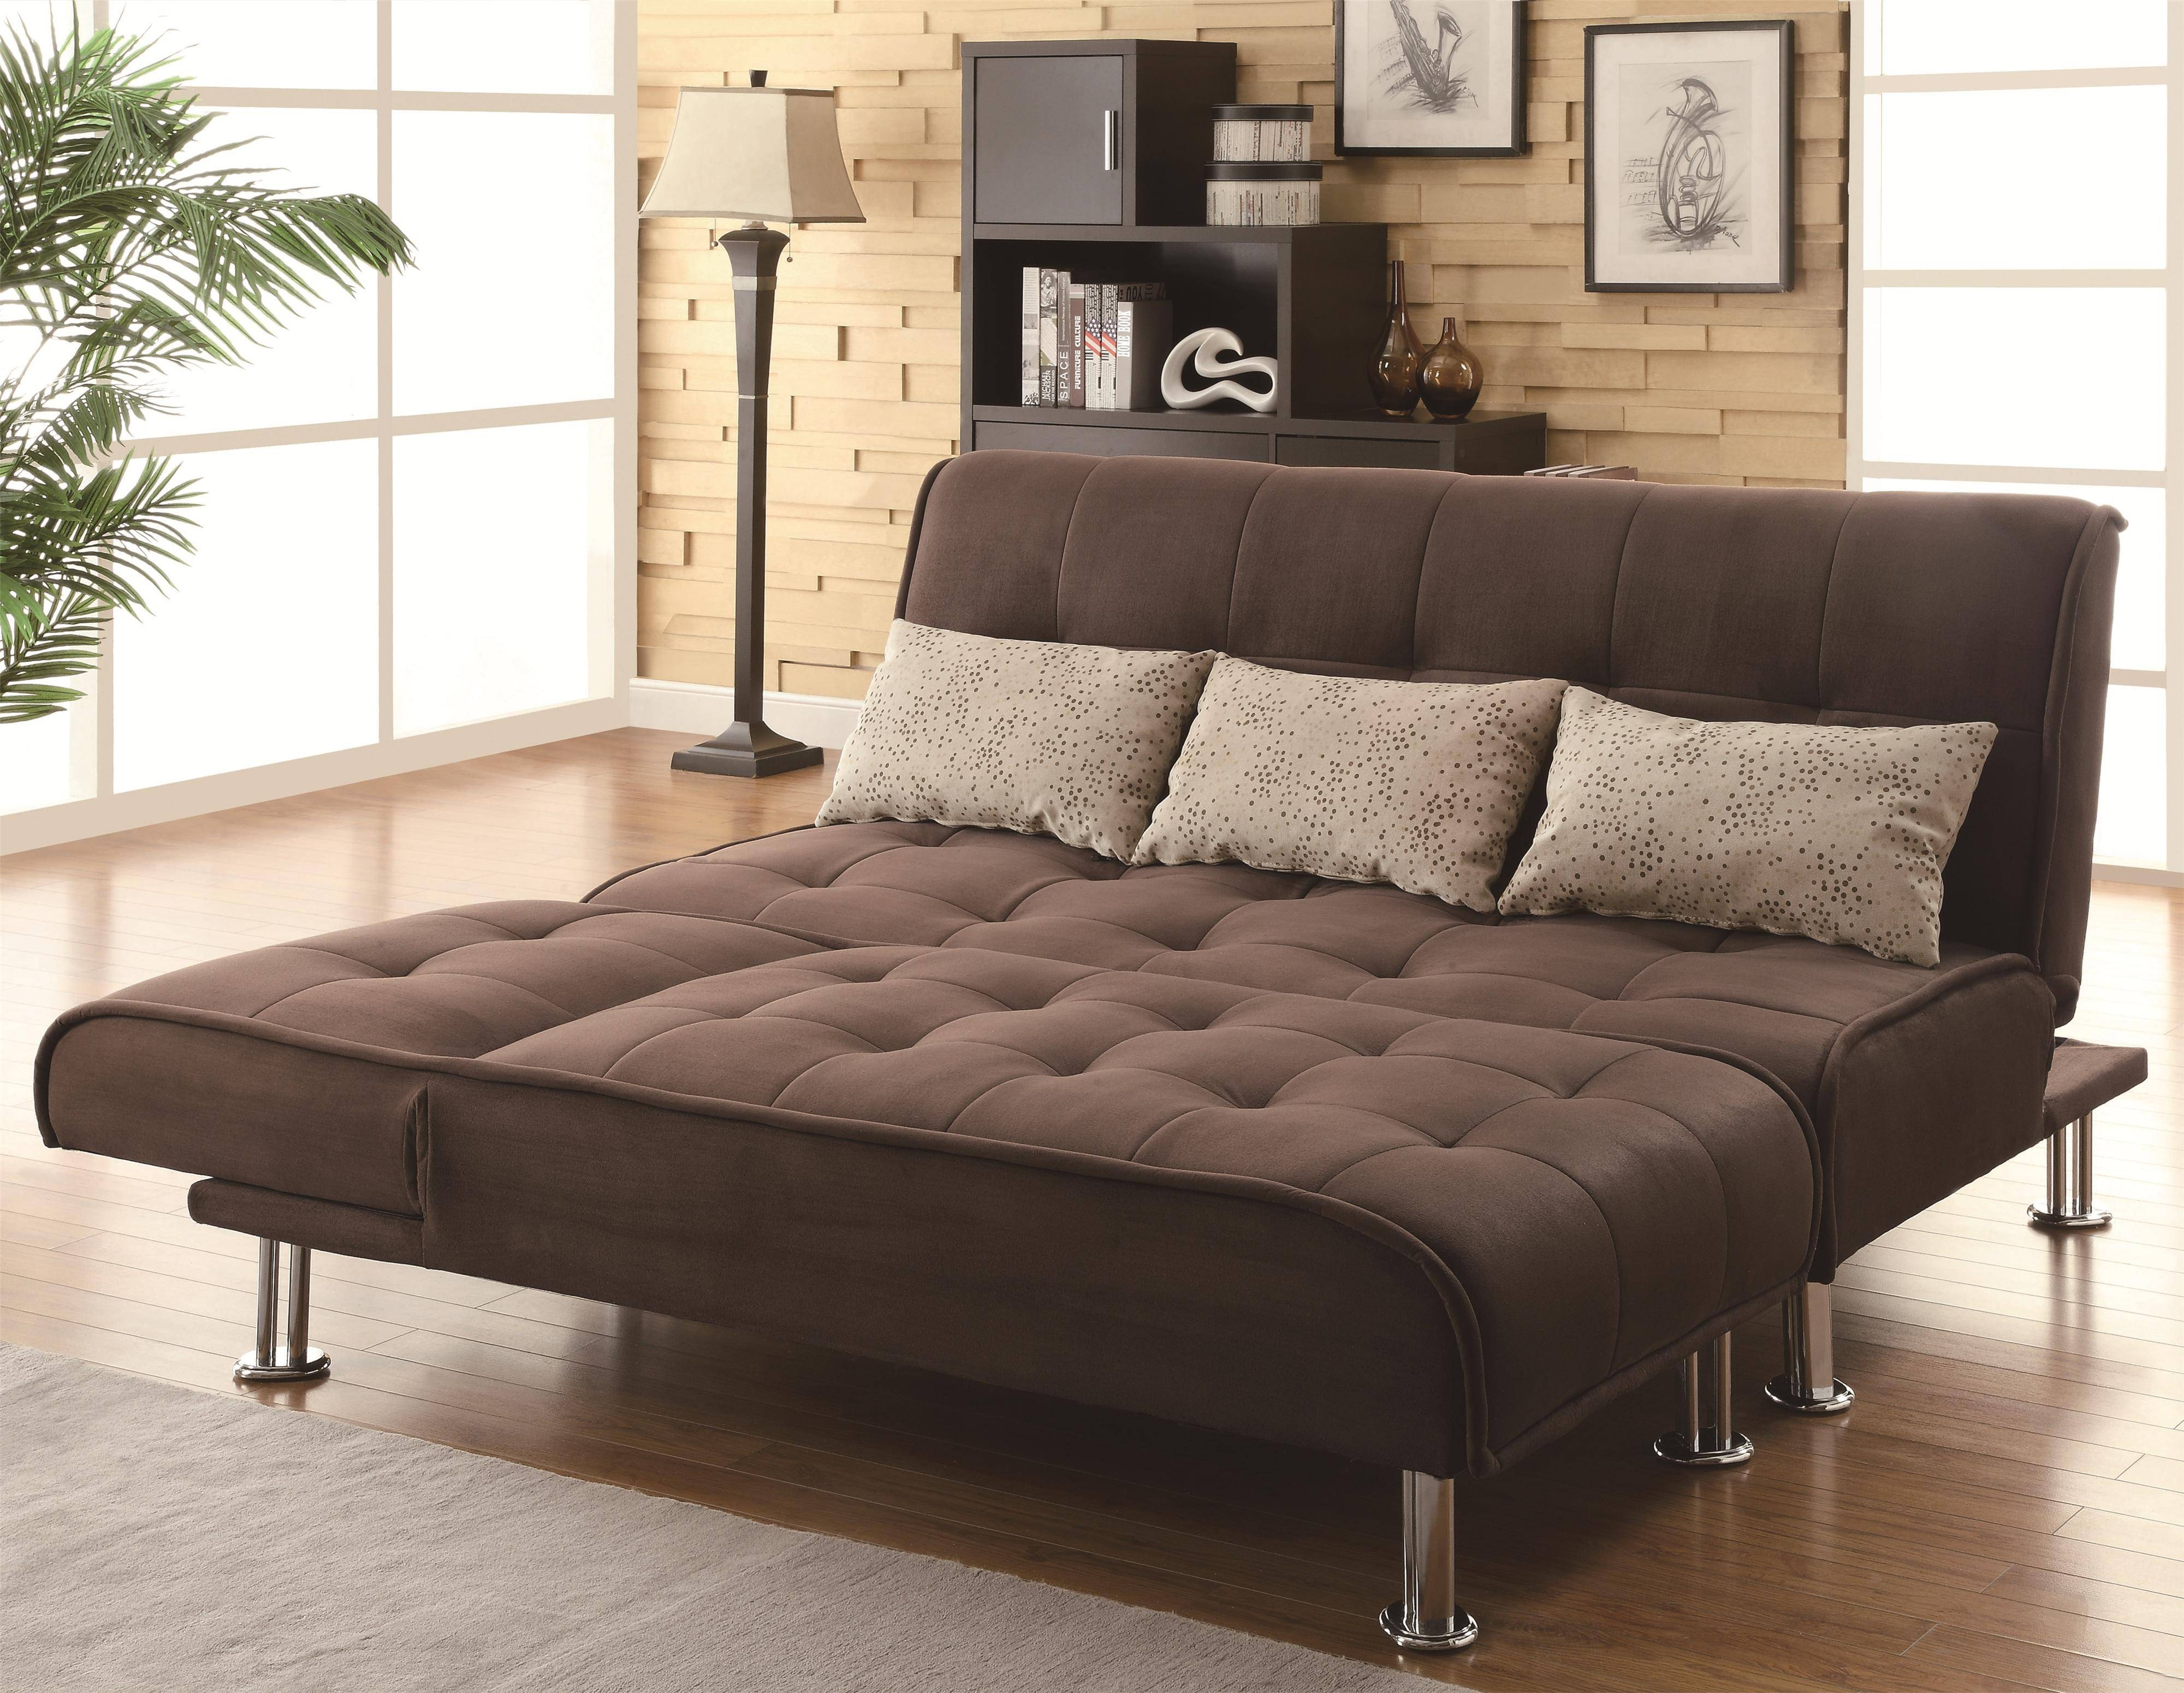 Sofas Center : Literarywondrous Inch Sleeper Sofa Photos Concept pertaining to 68 Inch Sofas (Image 25 of 30)